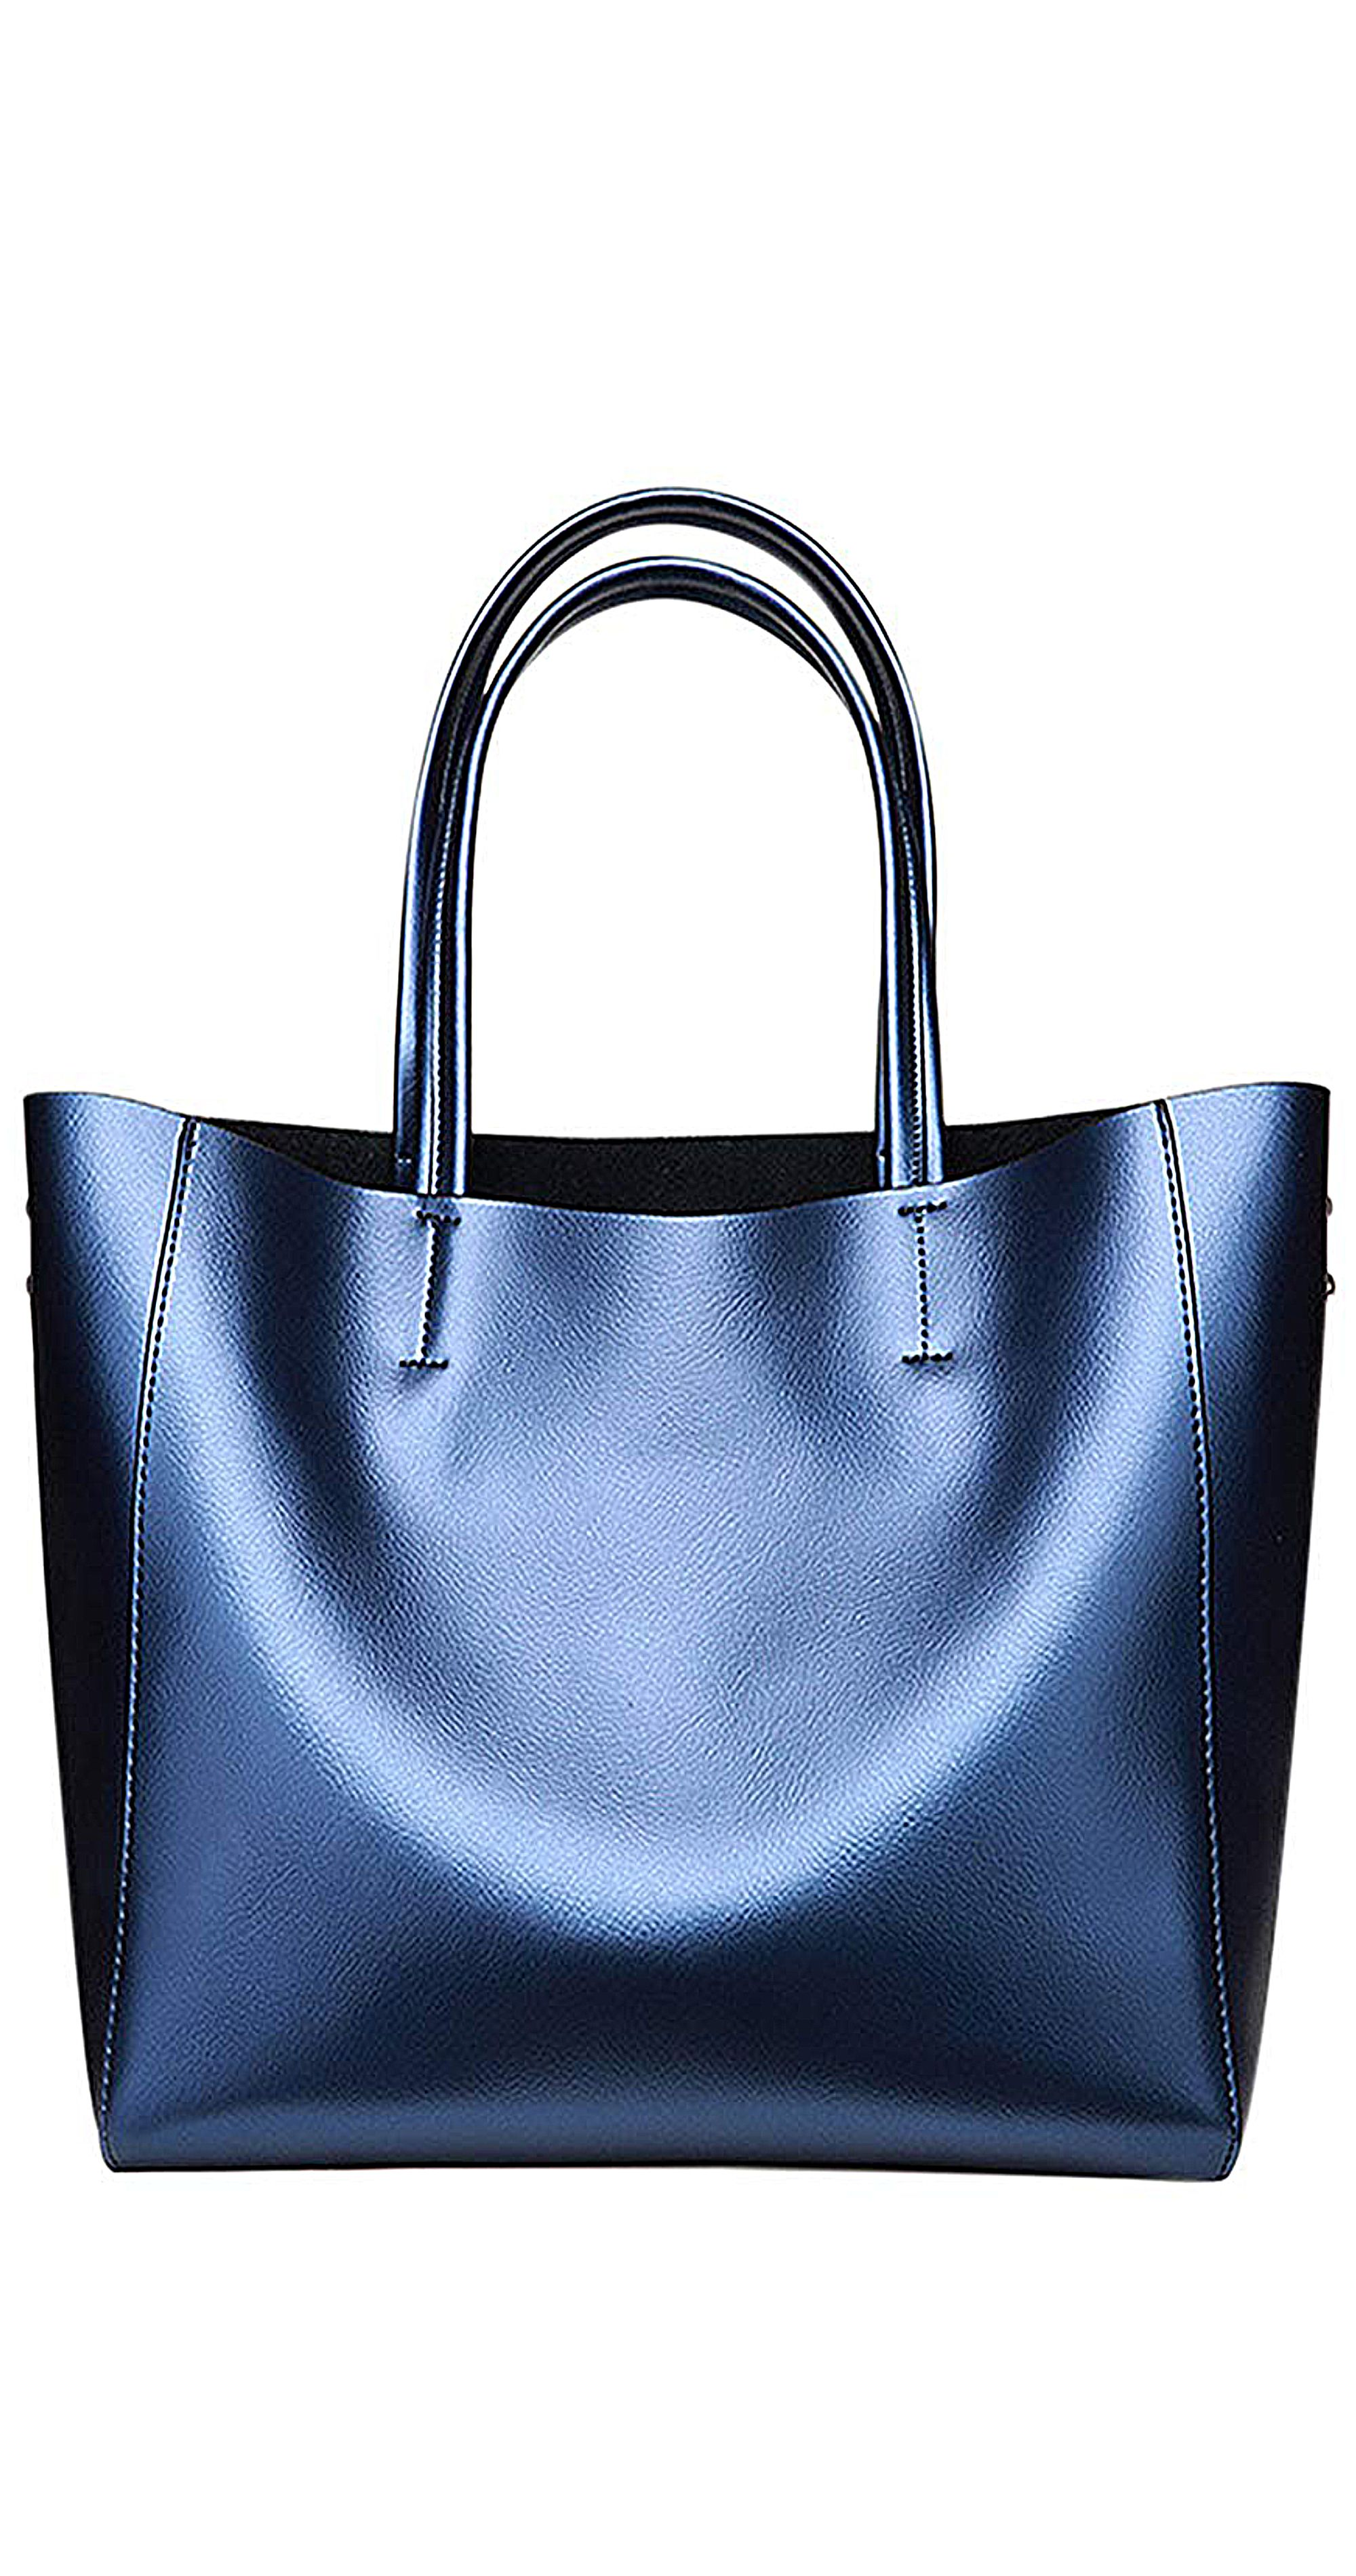 d540fd06a8b9 Anynow Luxurious Women s Genuine Leather Handbag Fashion Cowhide Shoulder  Bag Ladies Tote Bag Woman s fashion bags